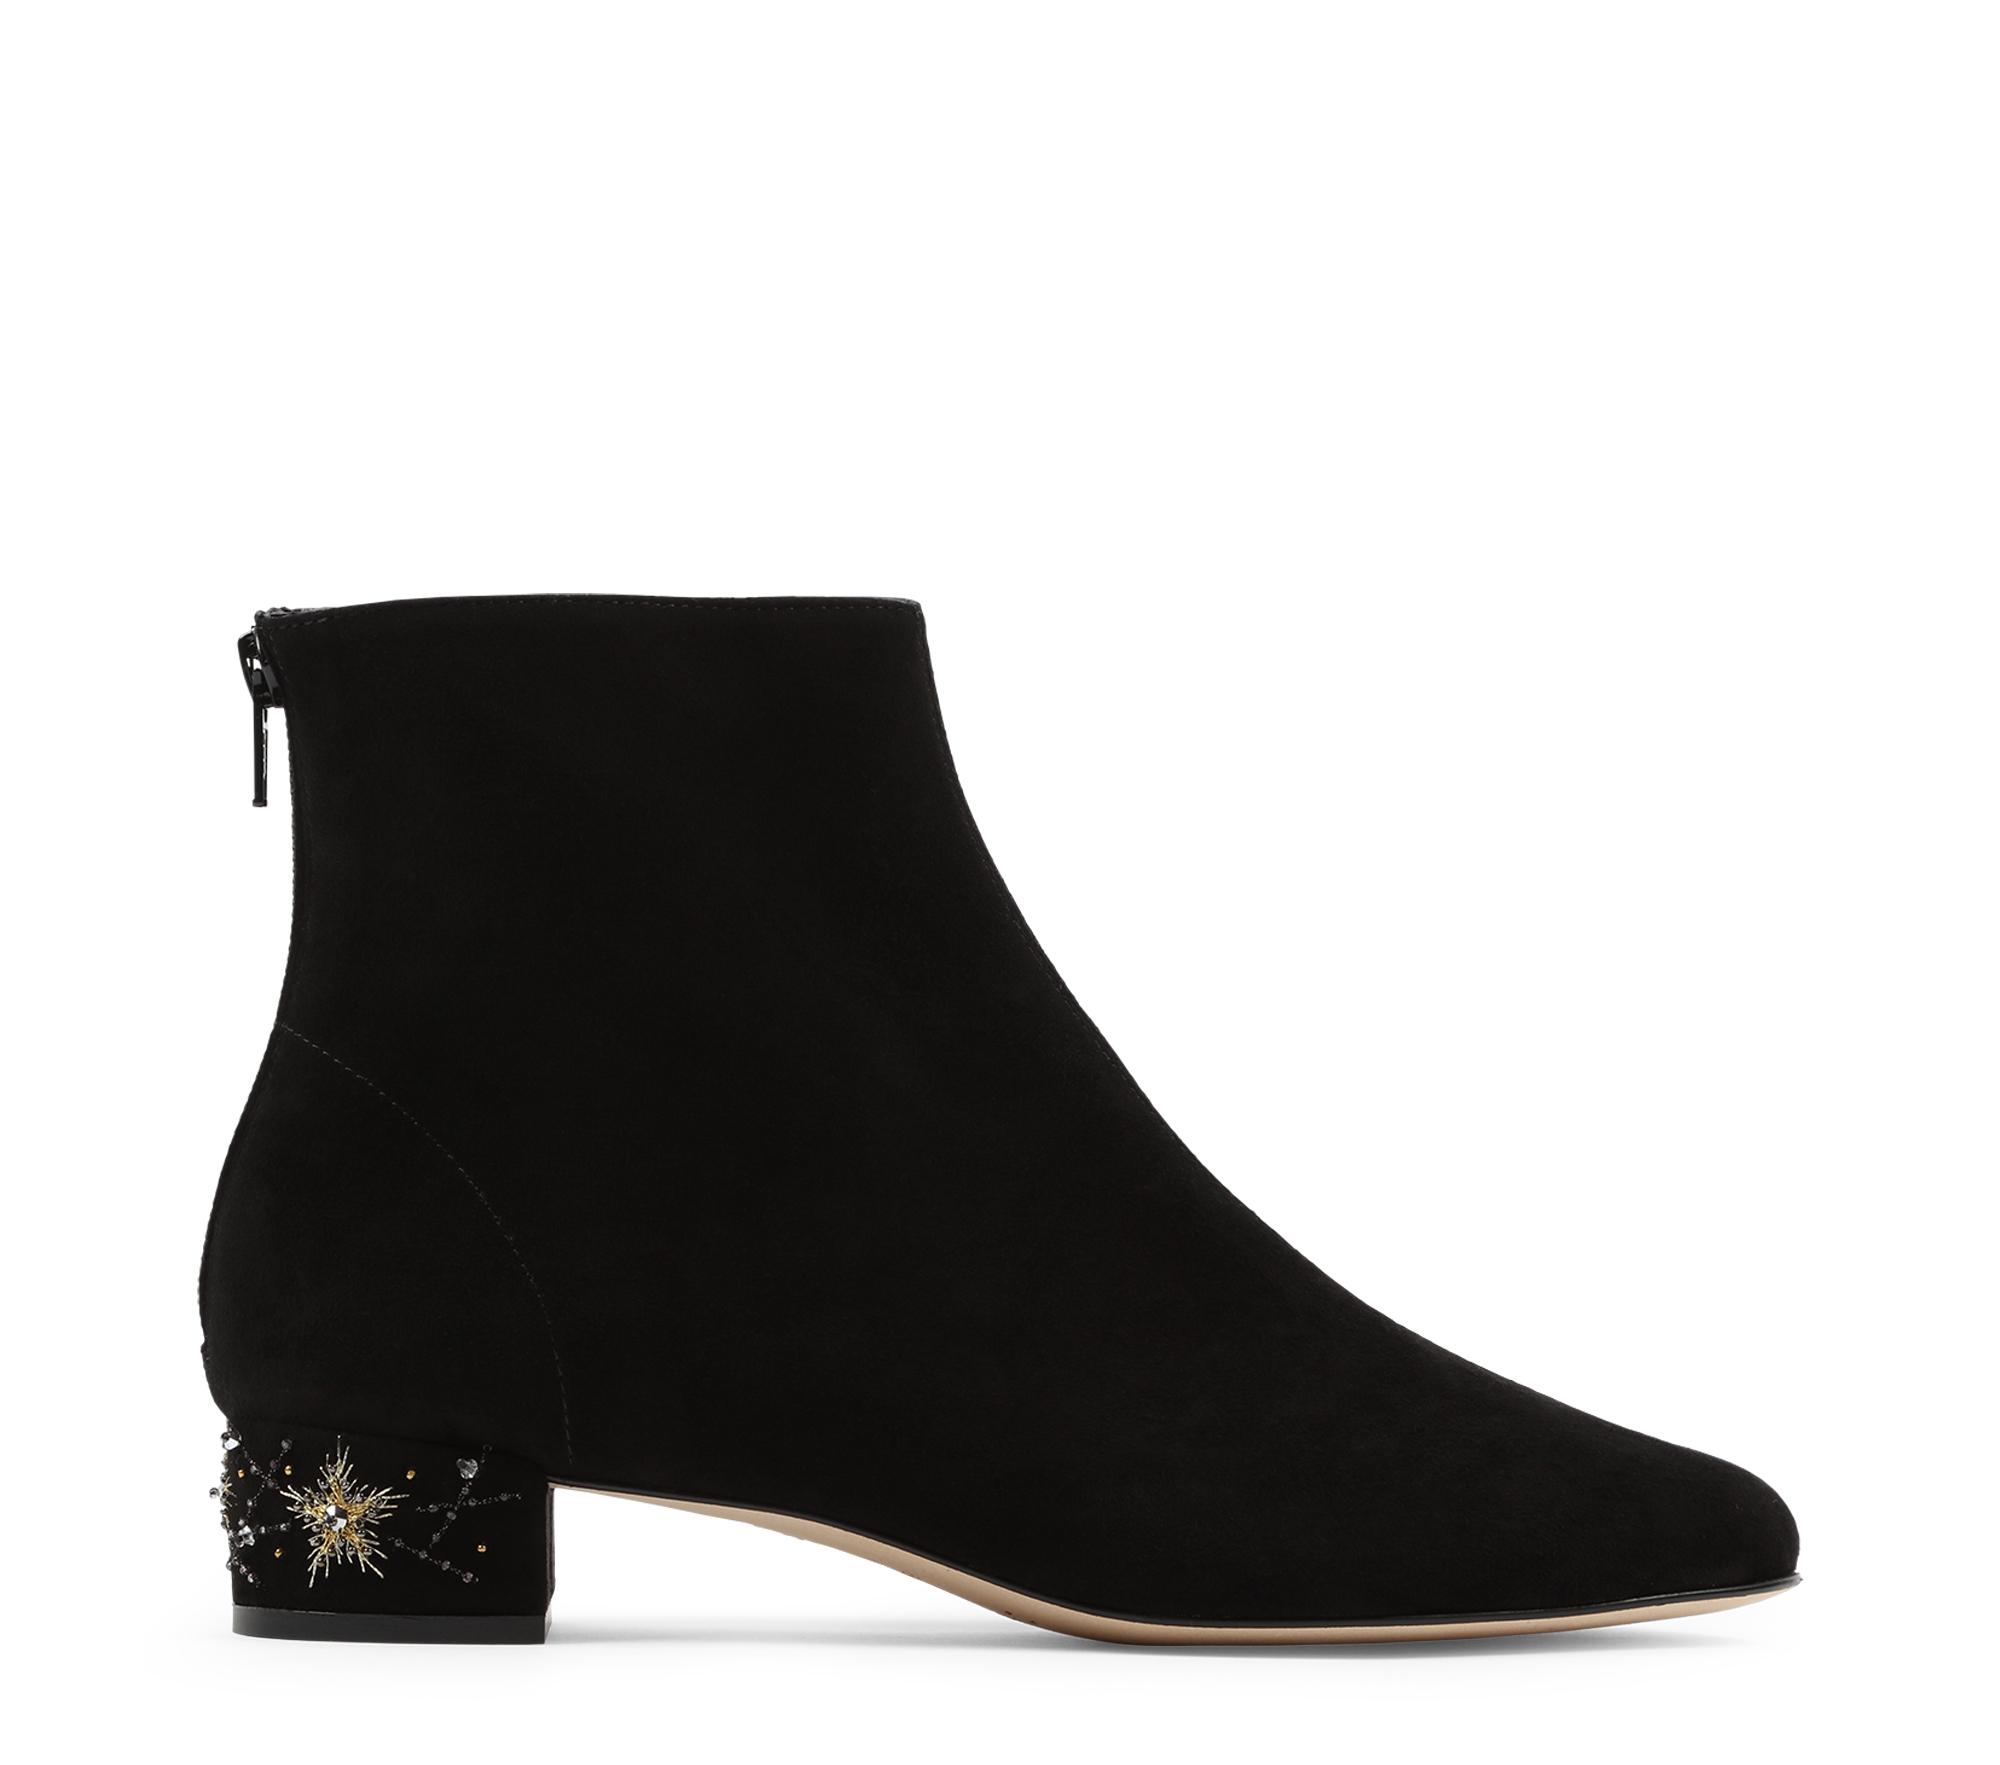 Jolaine boots